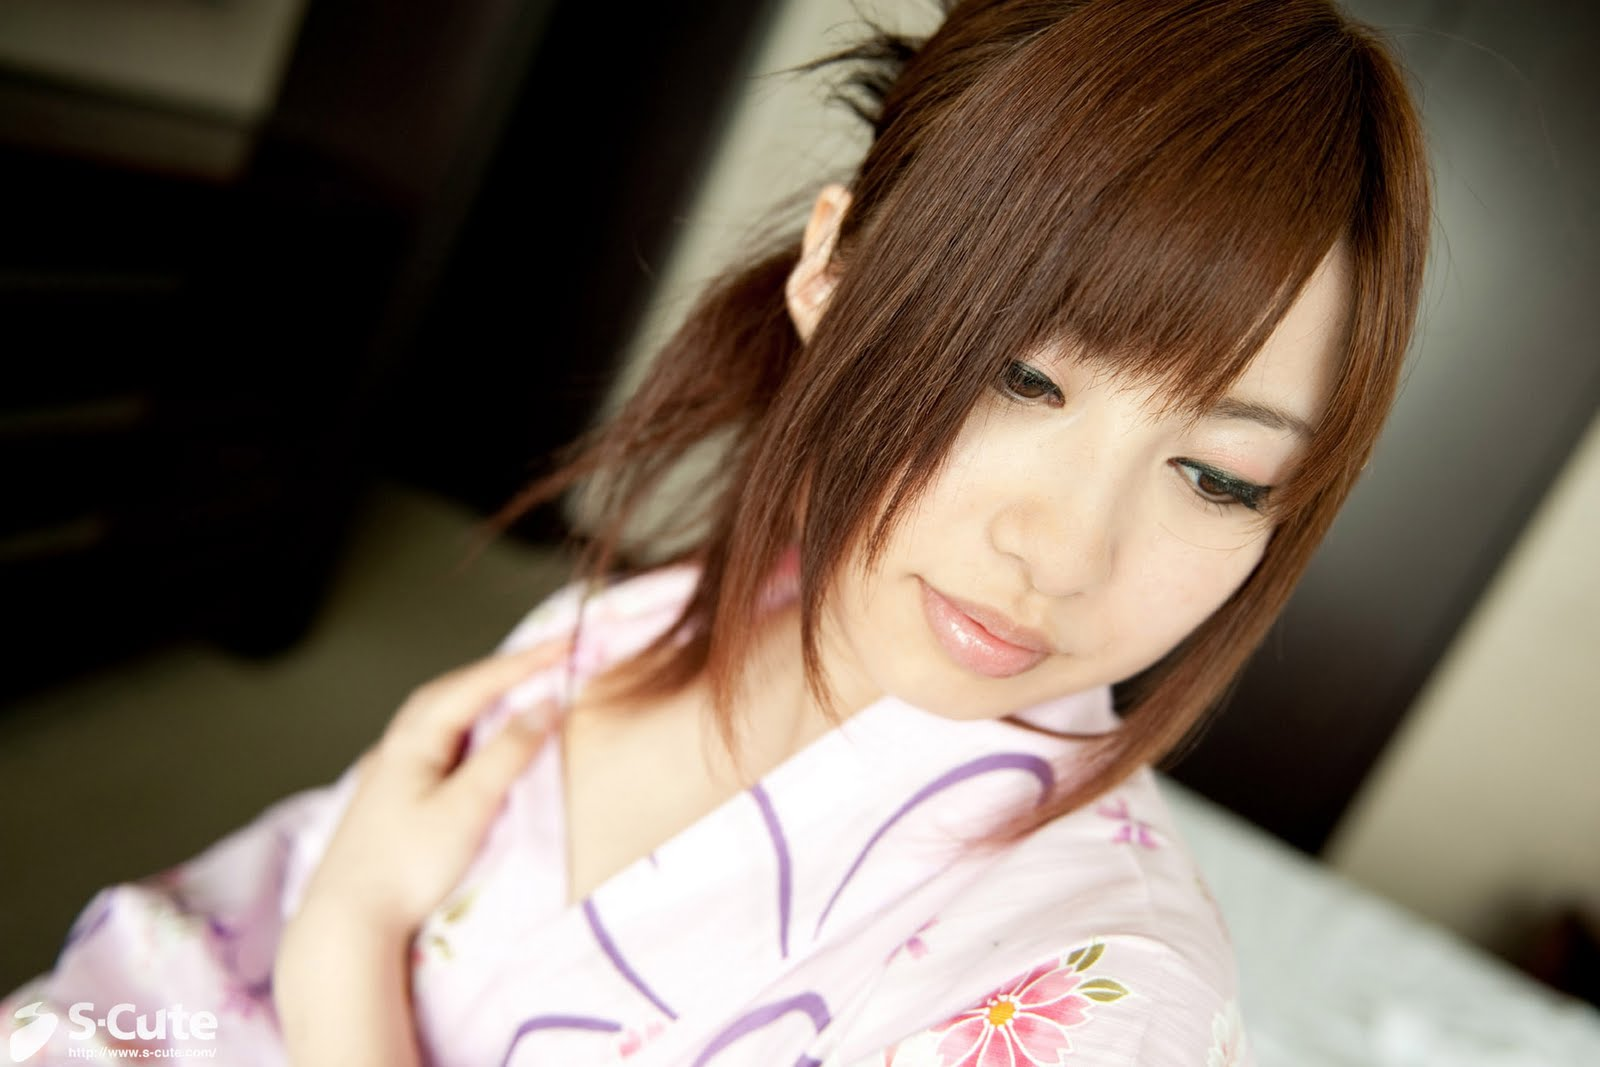 http://2.bp.blogspot.com/-3qapkG1Jjdw/TgNXfvKhIgI/AAAAAAAACGY/mG9aDN4yohw/s1600/Kokomi+Naruse+in+pink+kimono-02.jpg